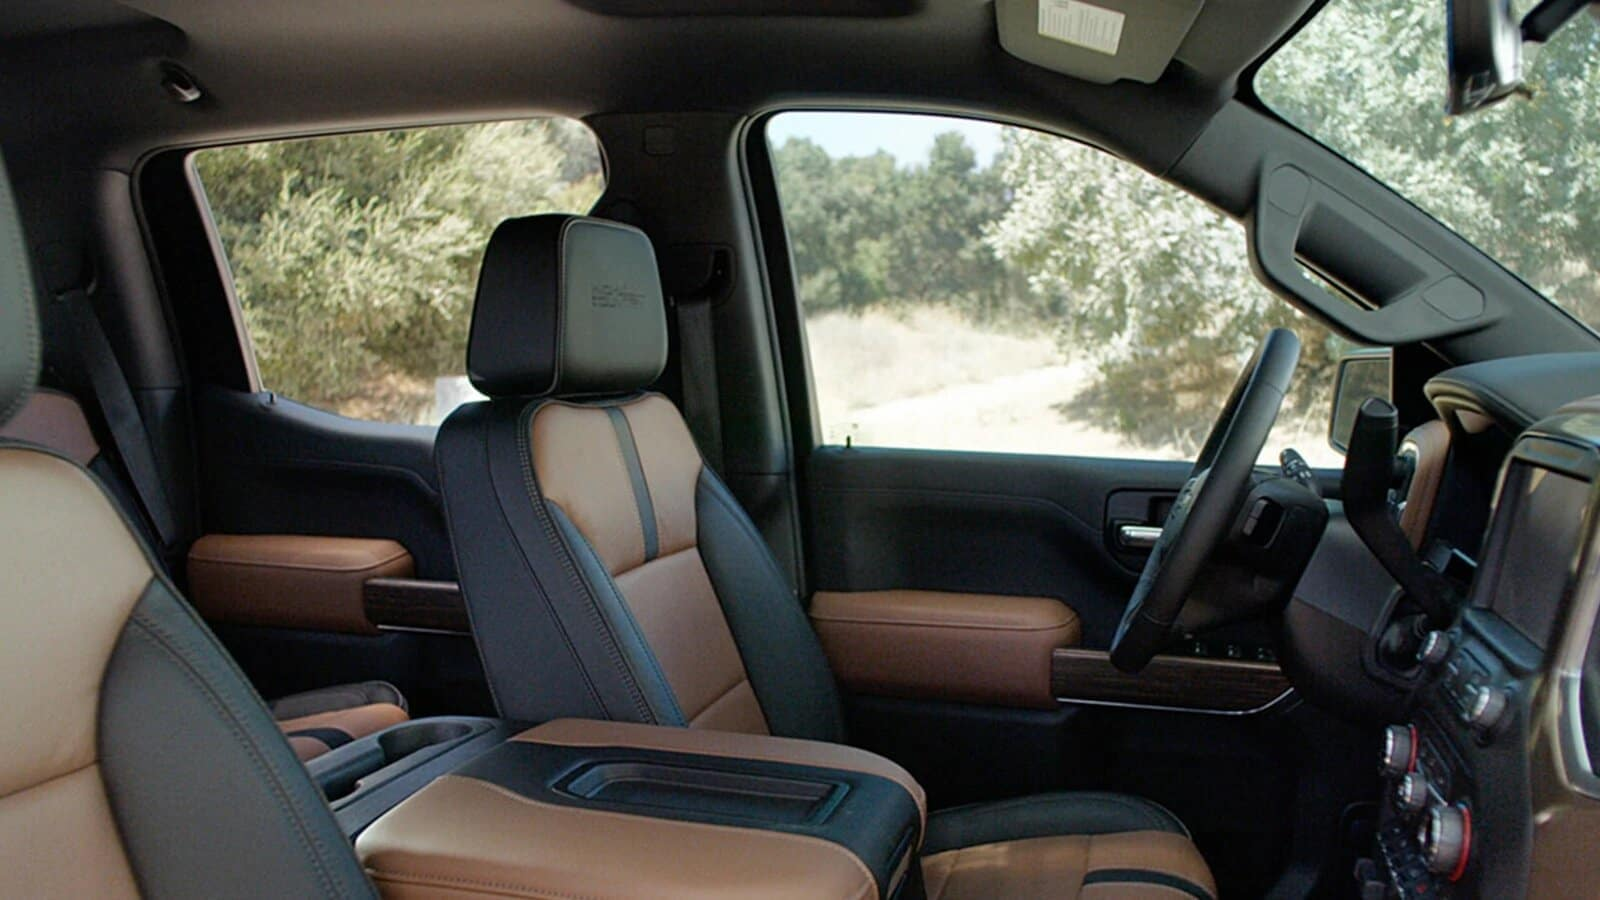 2020 Chevy Silverado 1500 Near Tulsa, OK Has the Interior You Have Always Wanted